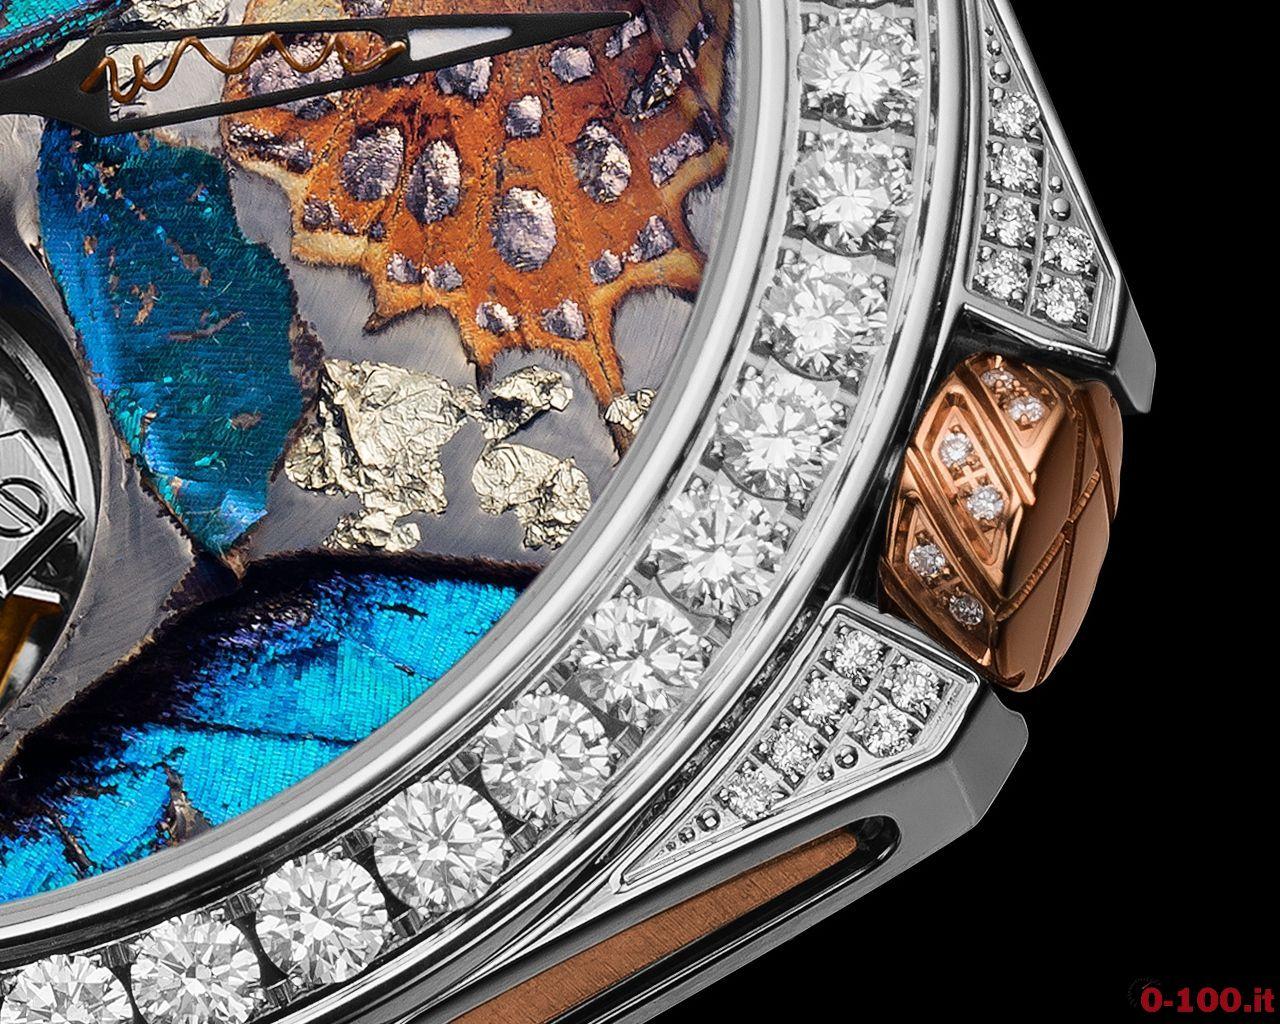 artya-butterfly-set-tourbillon-11-prezzo-price_0-1004